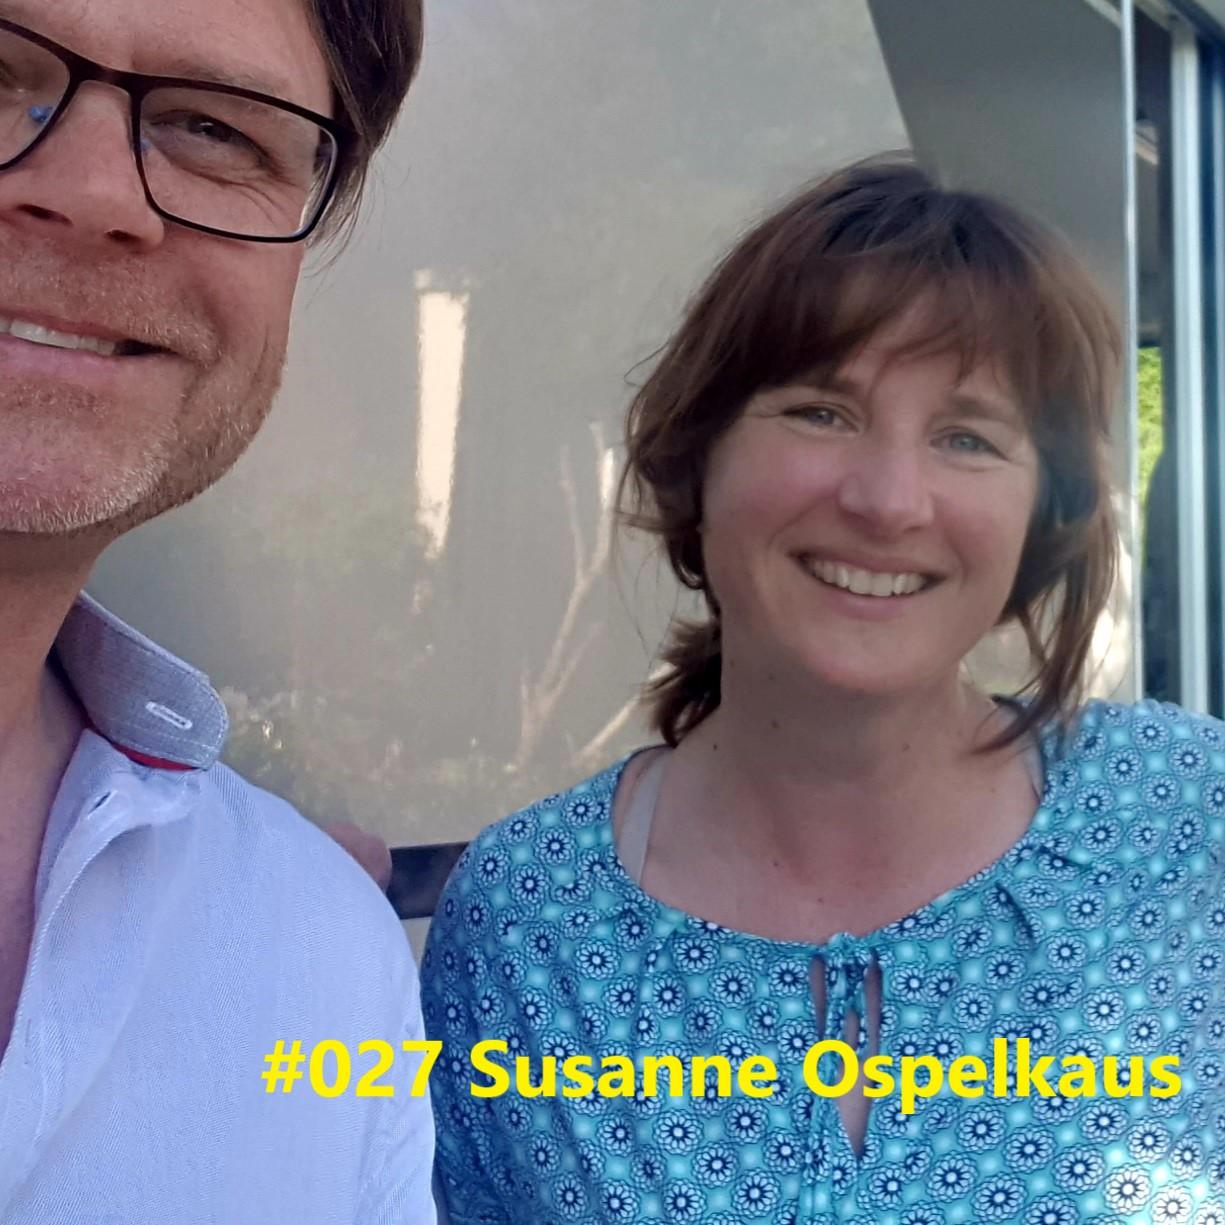 Susanne Ospelkaus